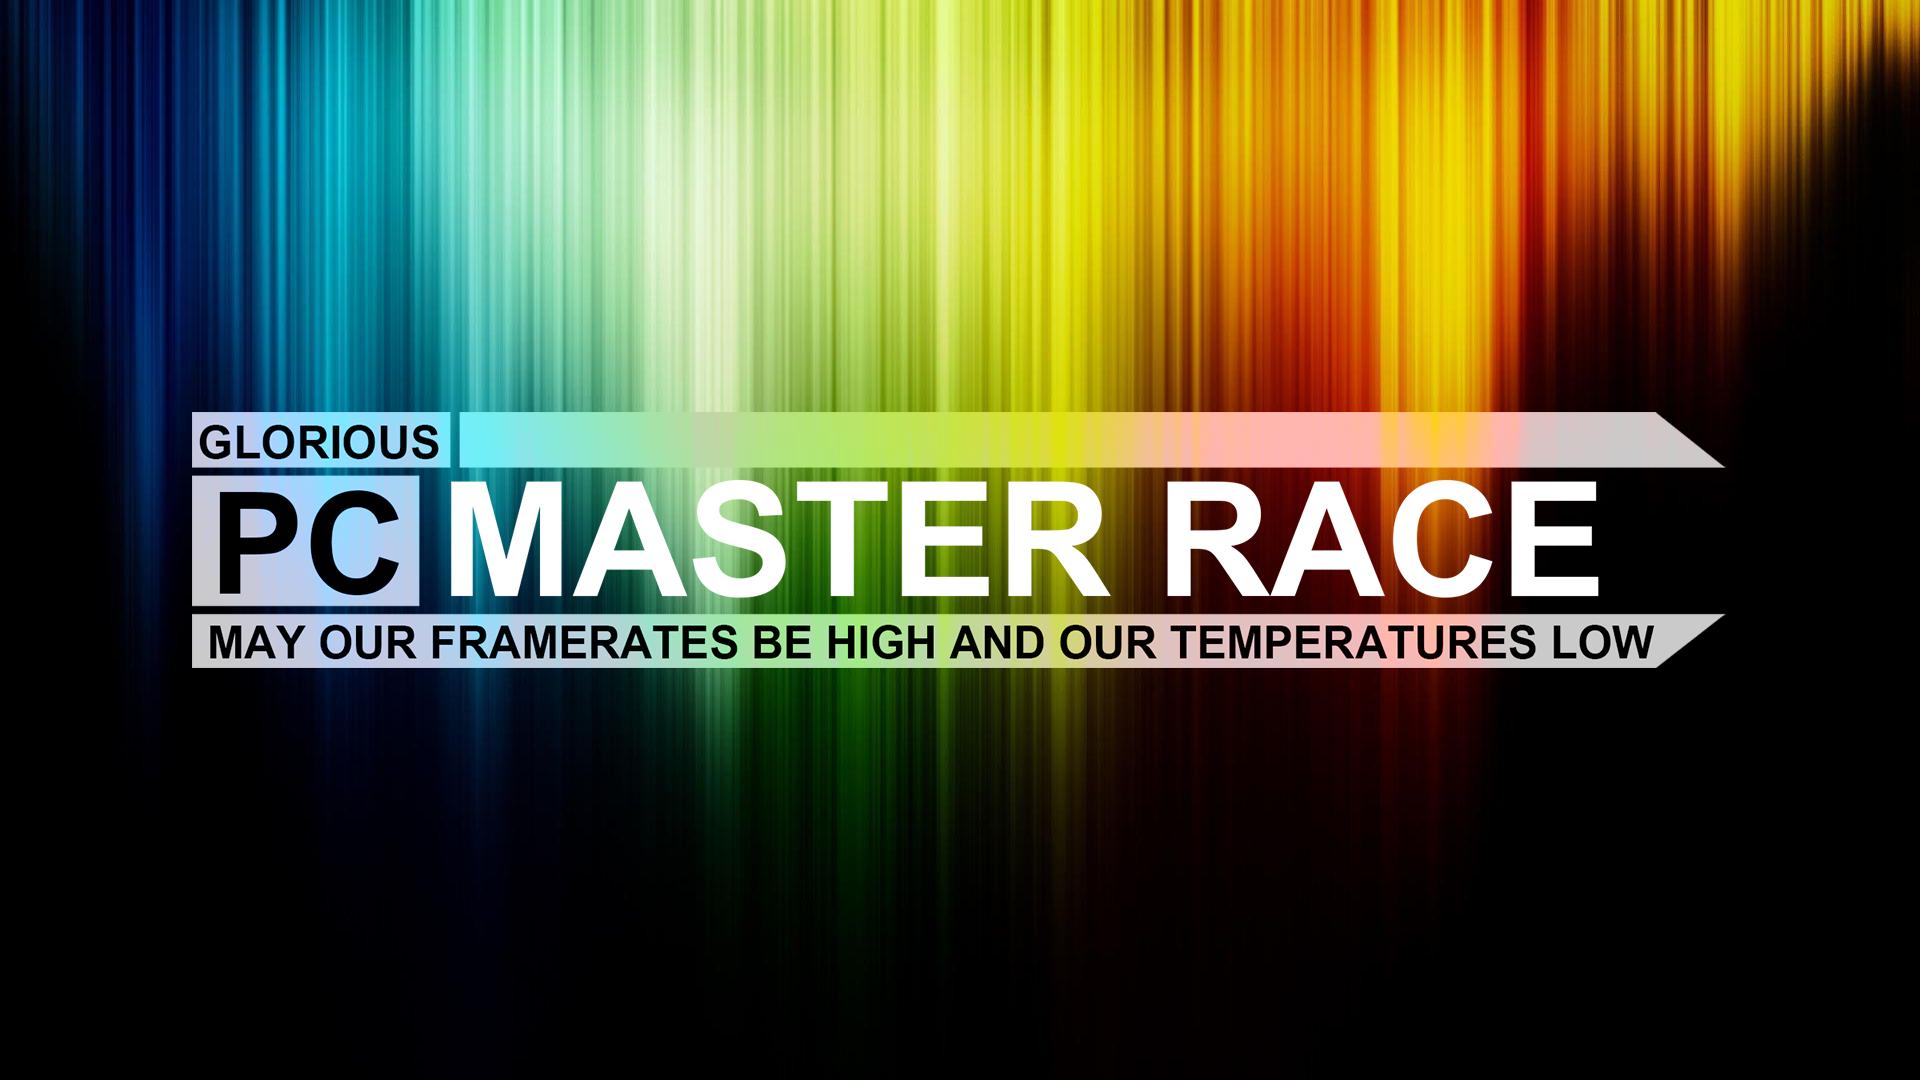 Free Download Glorious Pc Master Race Wallpaper Myconfinedspace